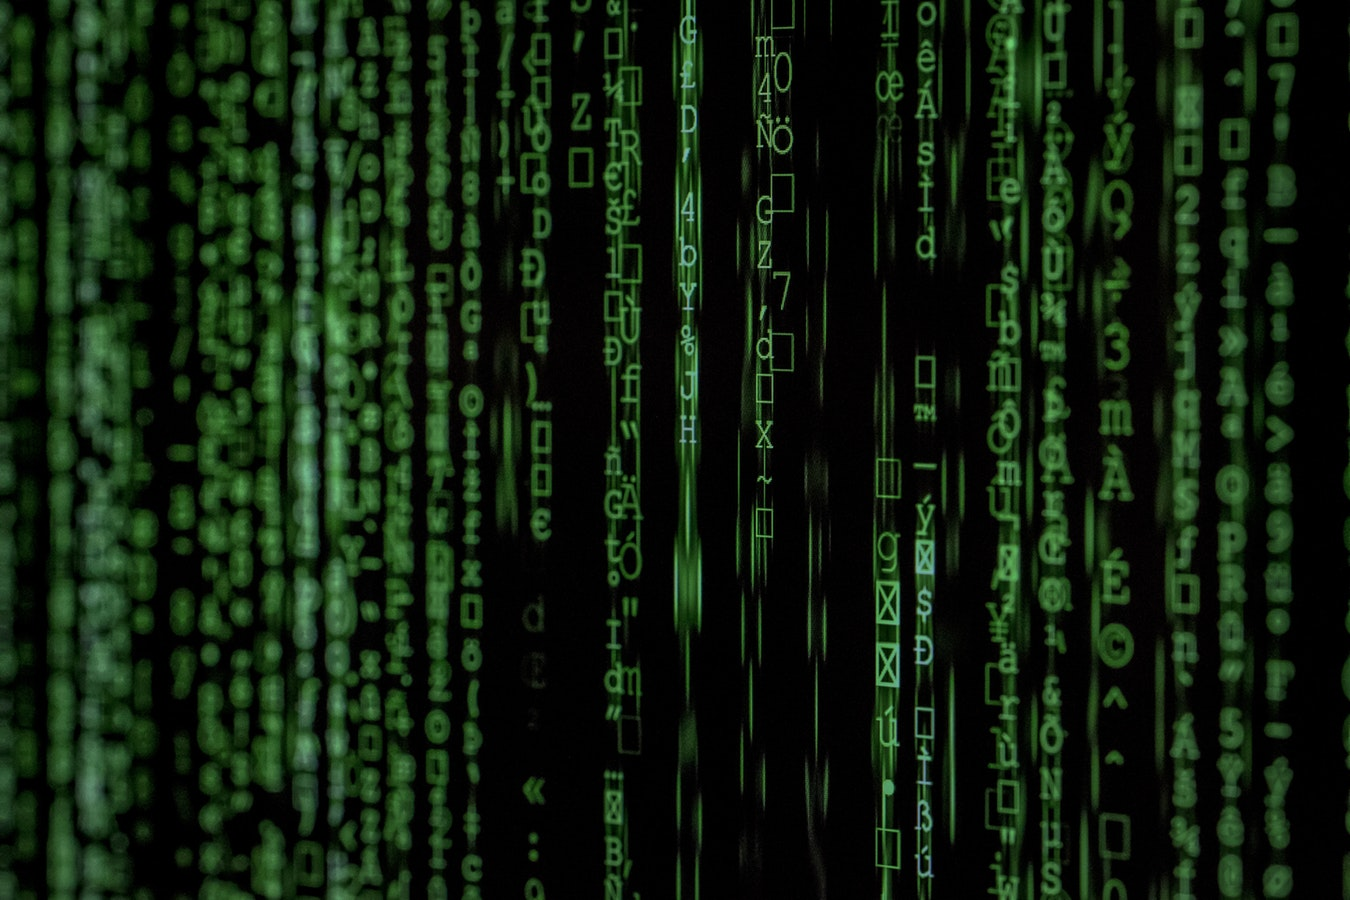 malware affects WordPress site performance